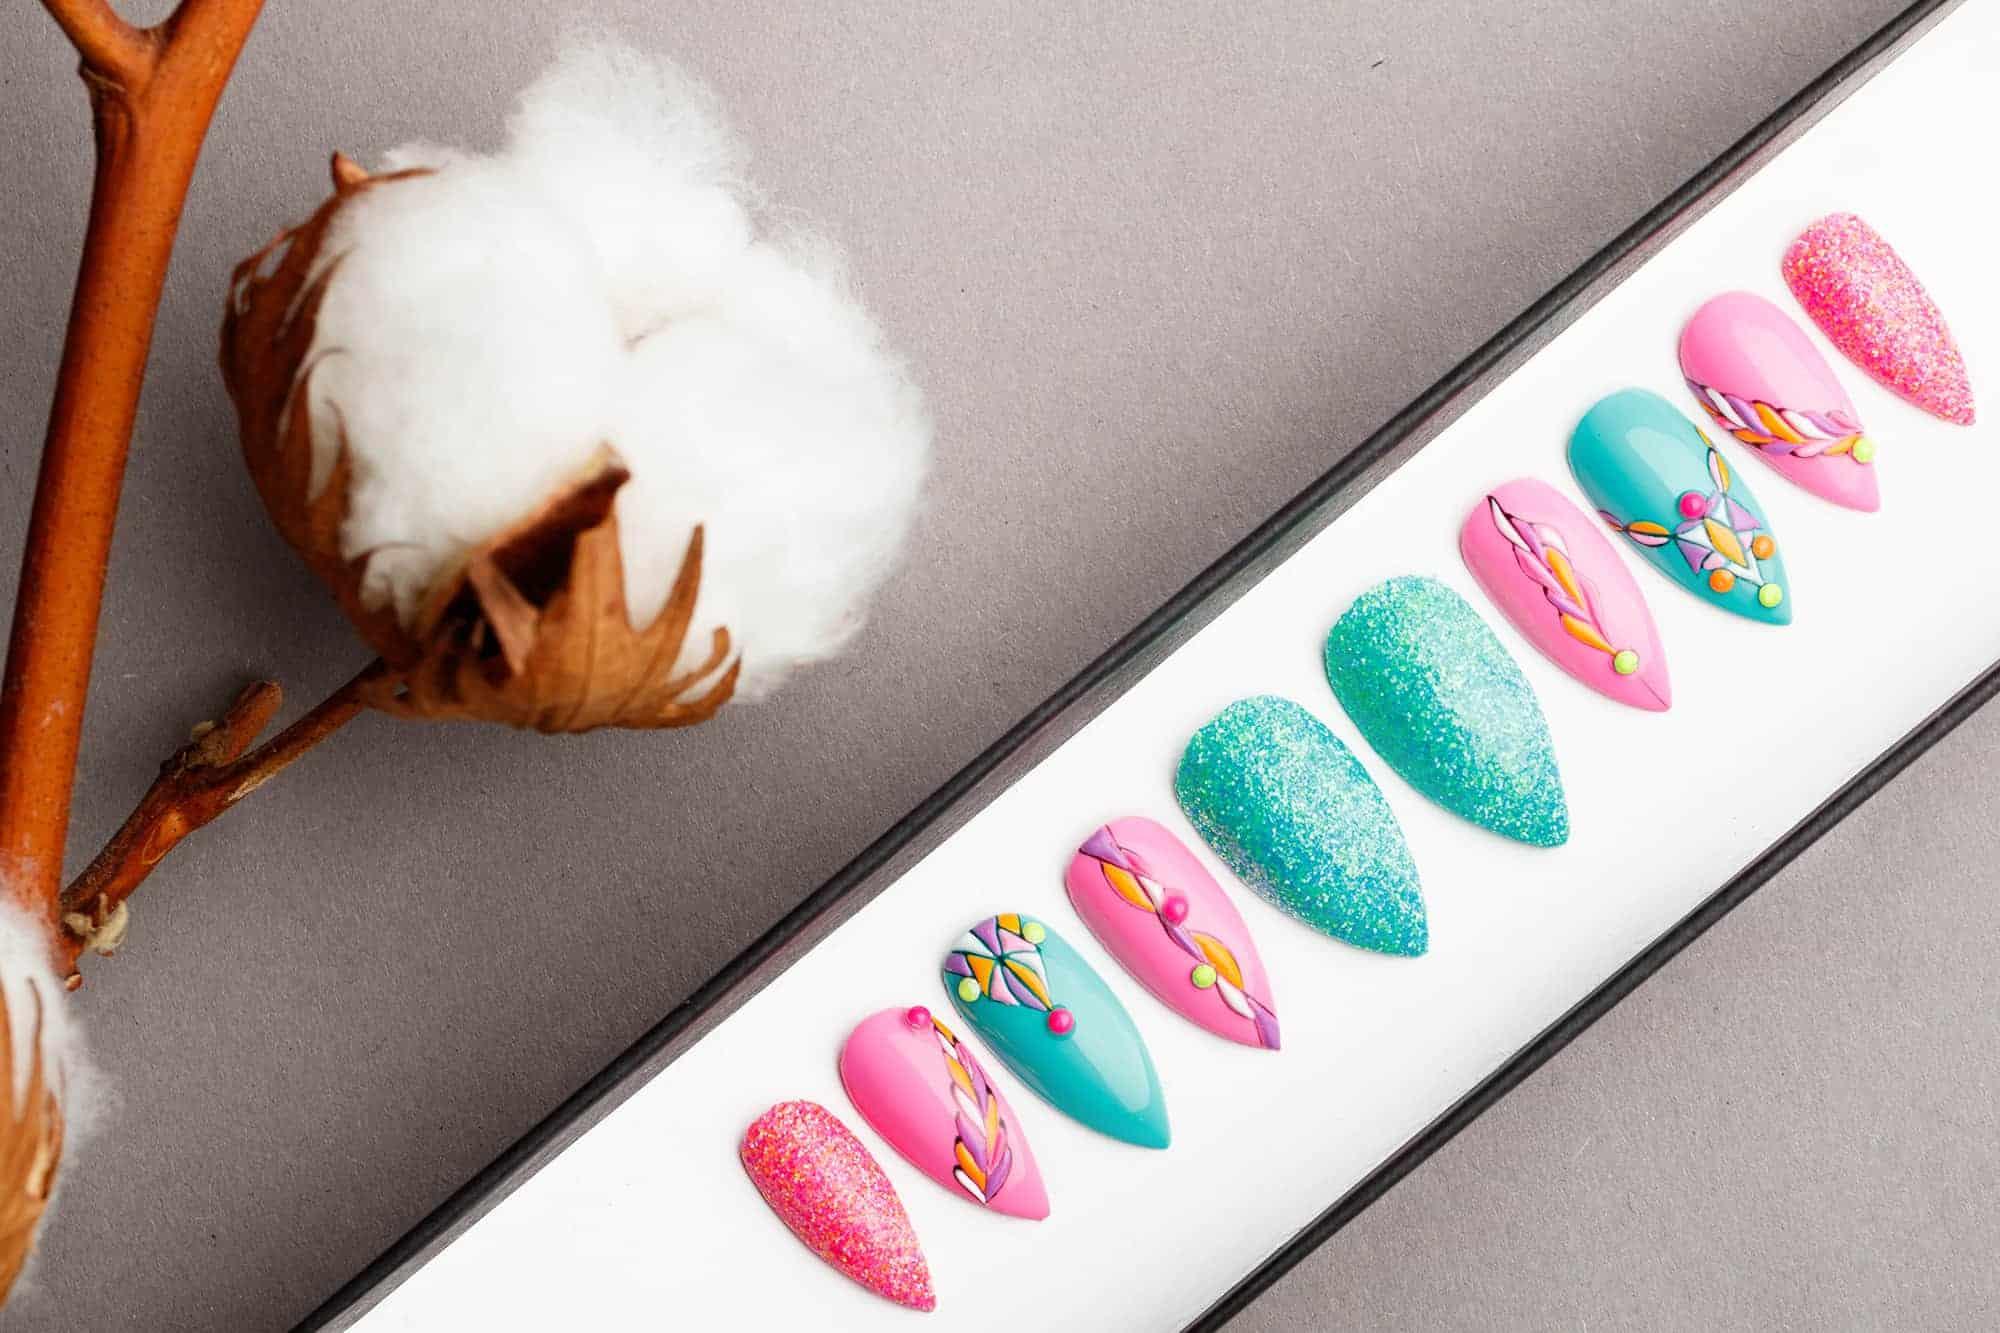 Pink And Turquoise Press on Nails | Fake Nails | False Nails | Glue On Nails | Tracery Nails | Acrylic Nails | Gel Nails